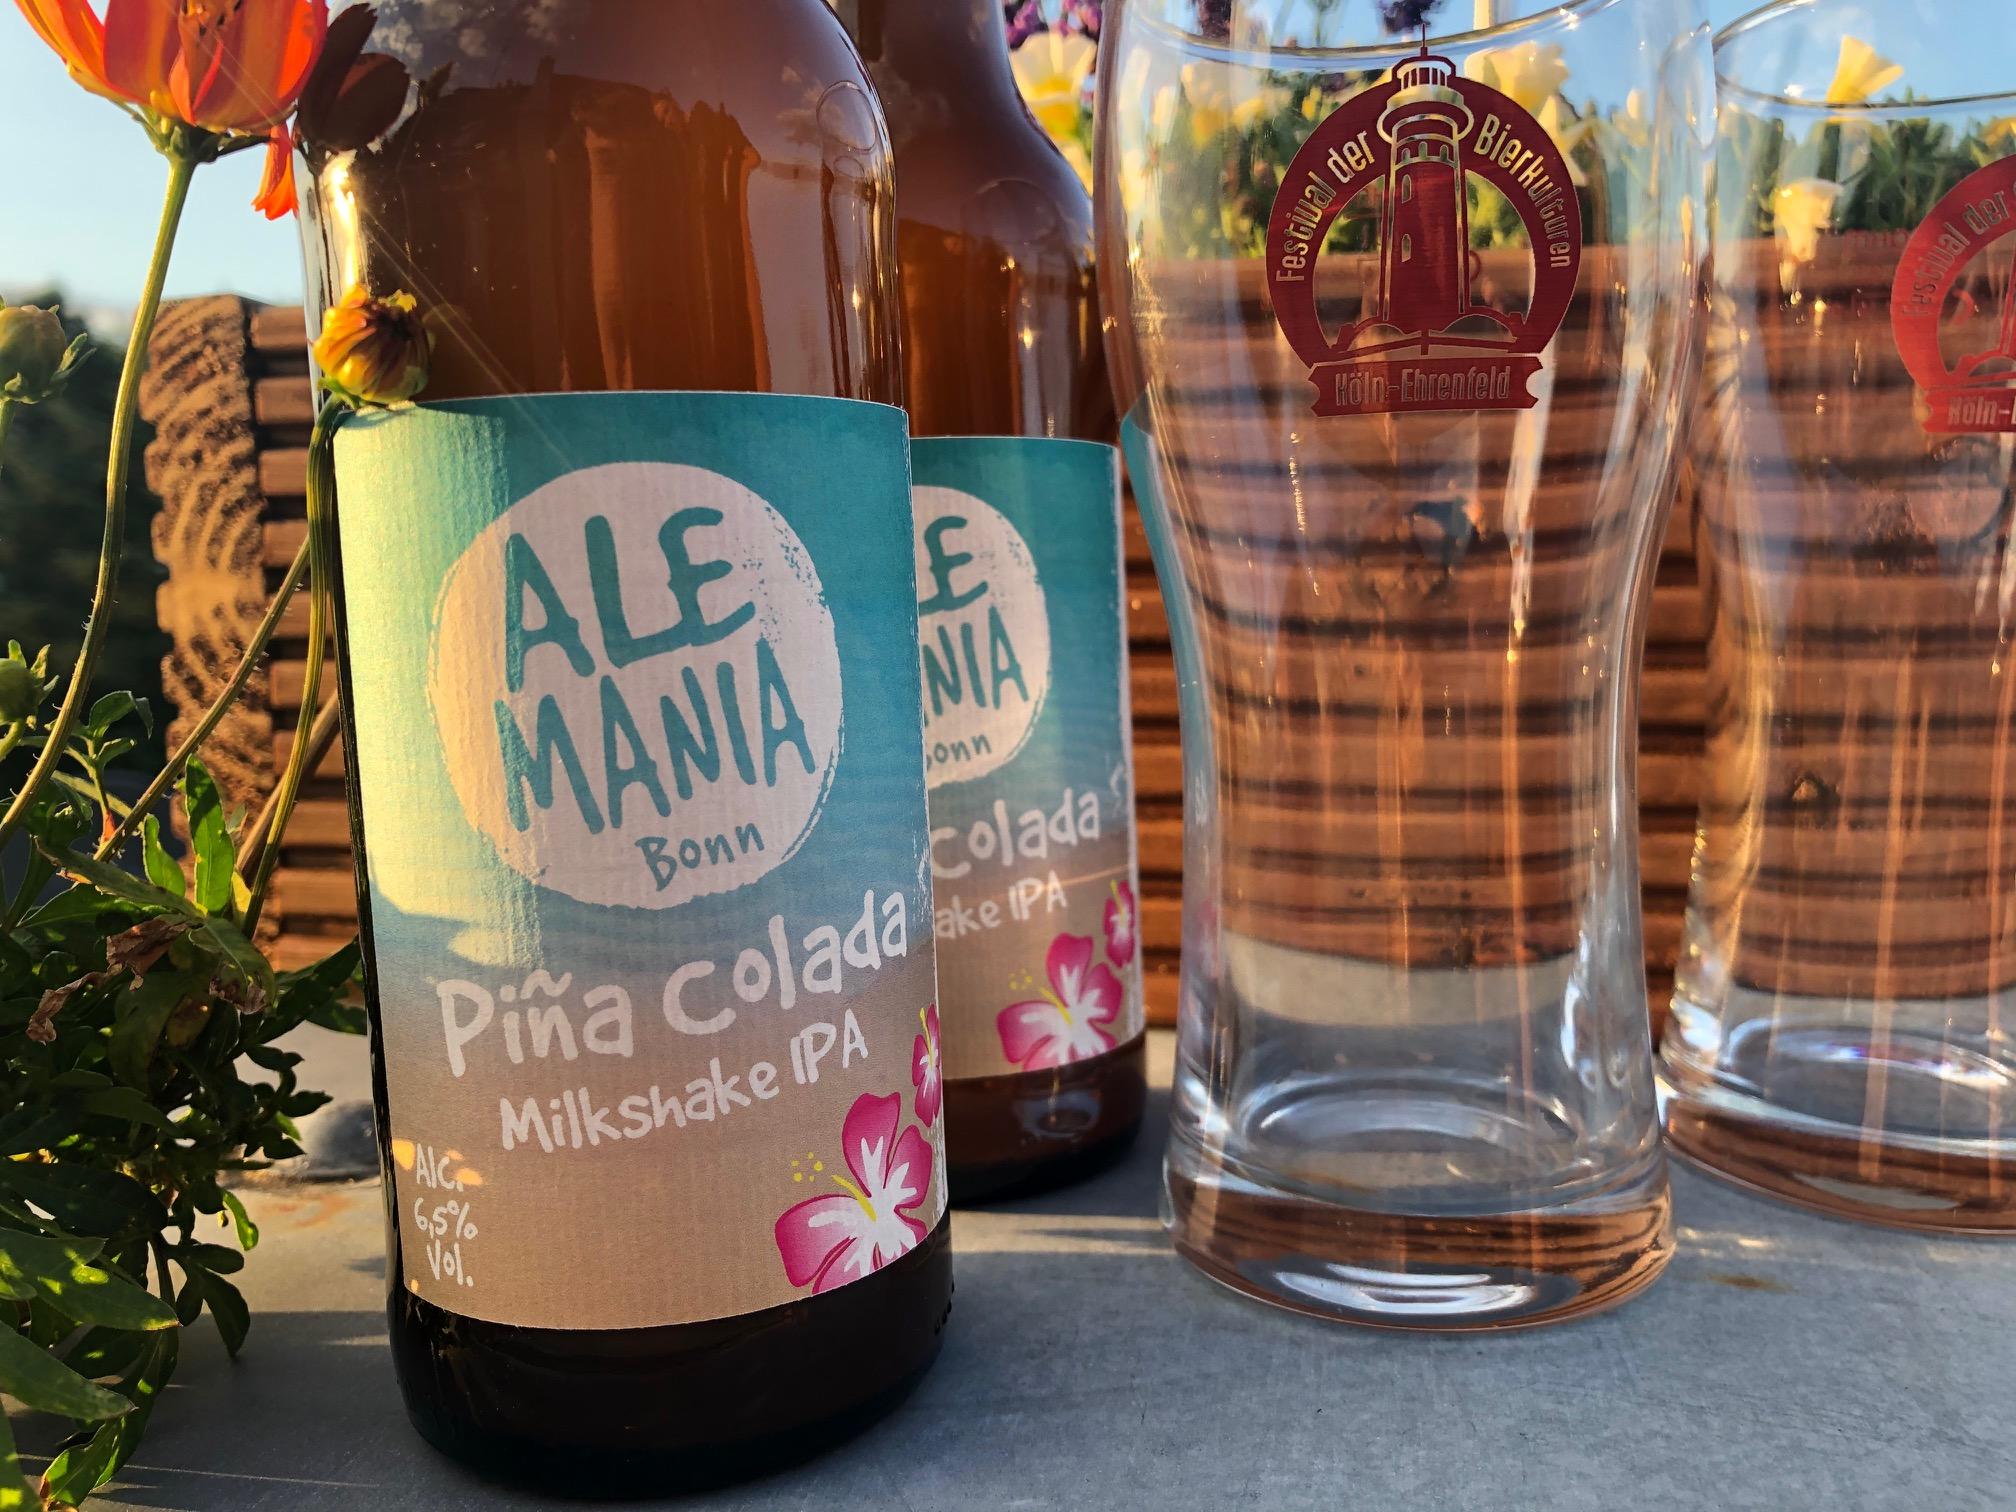 Ale-Mania-Pina-Colada-Milkshake-IPA